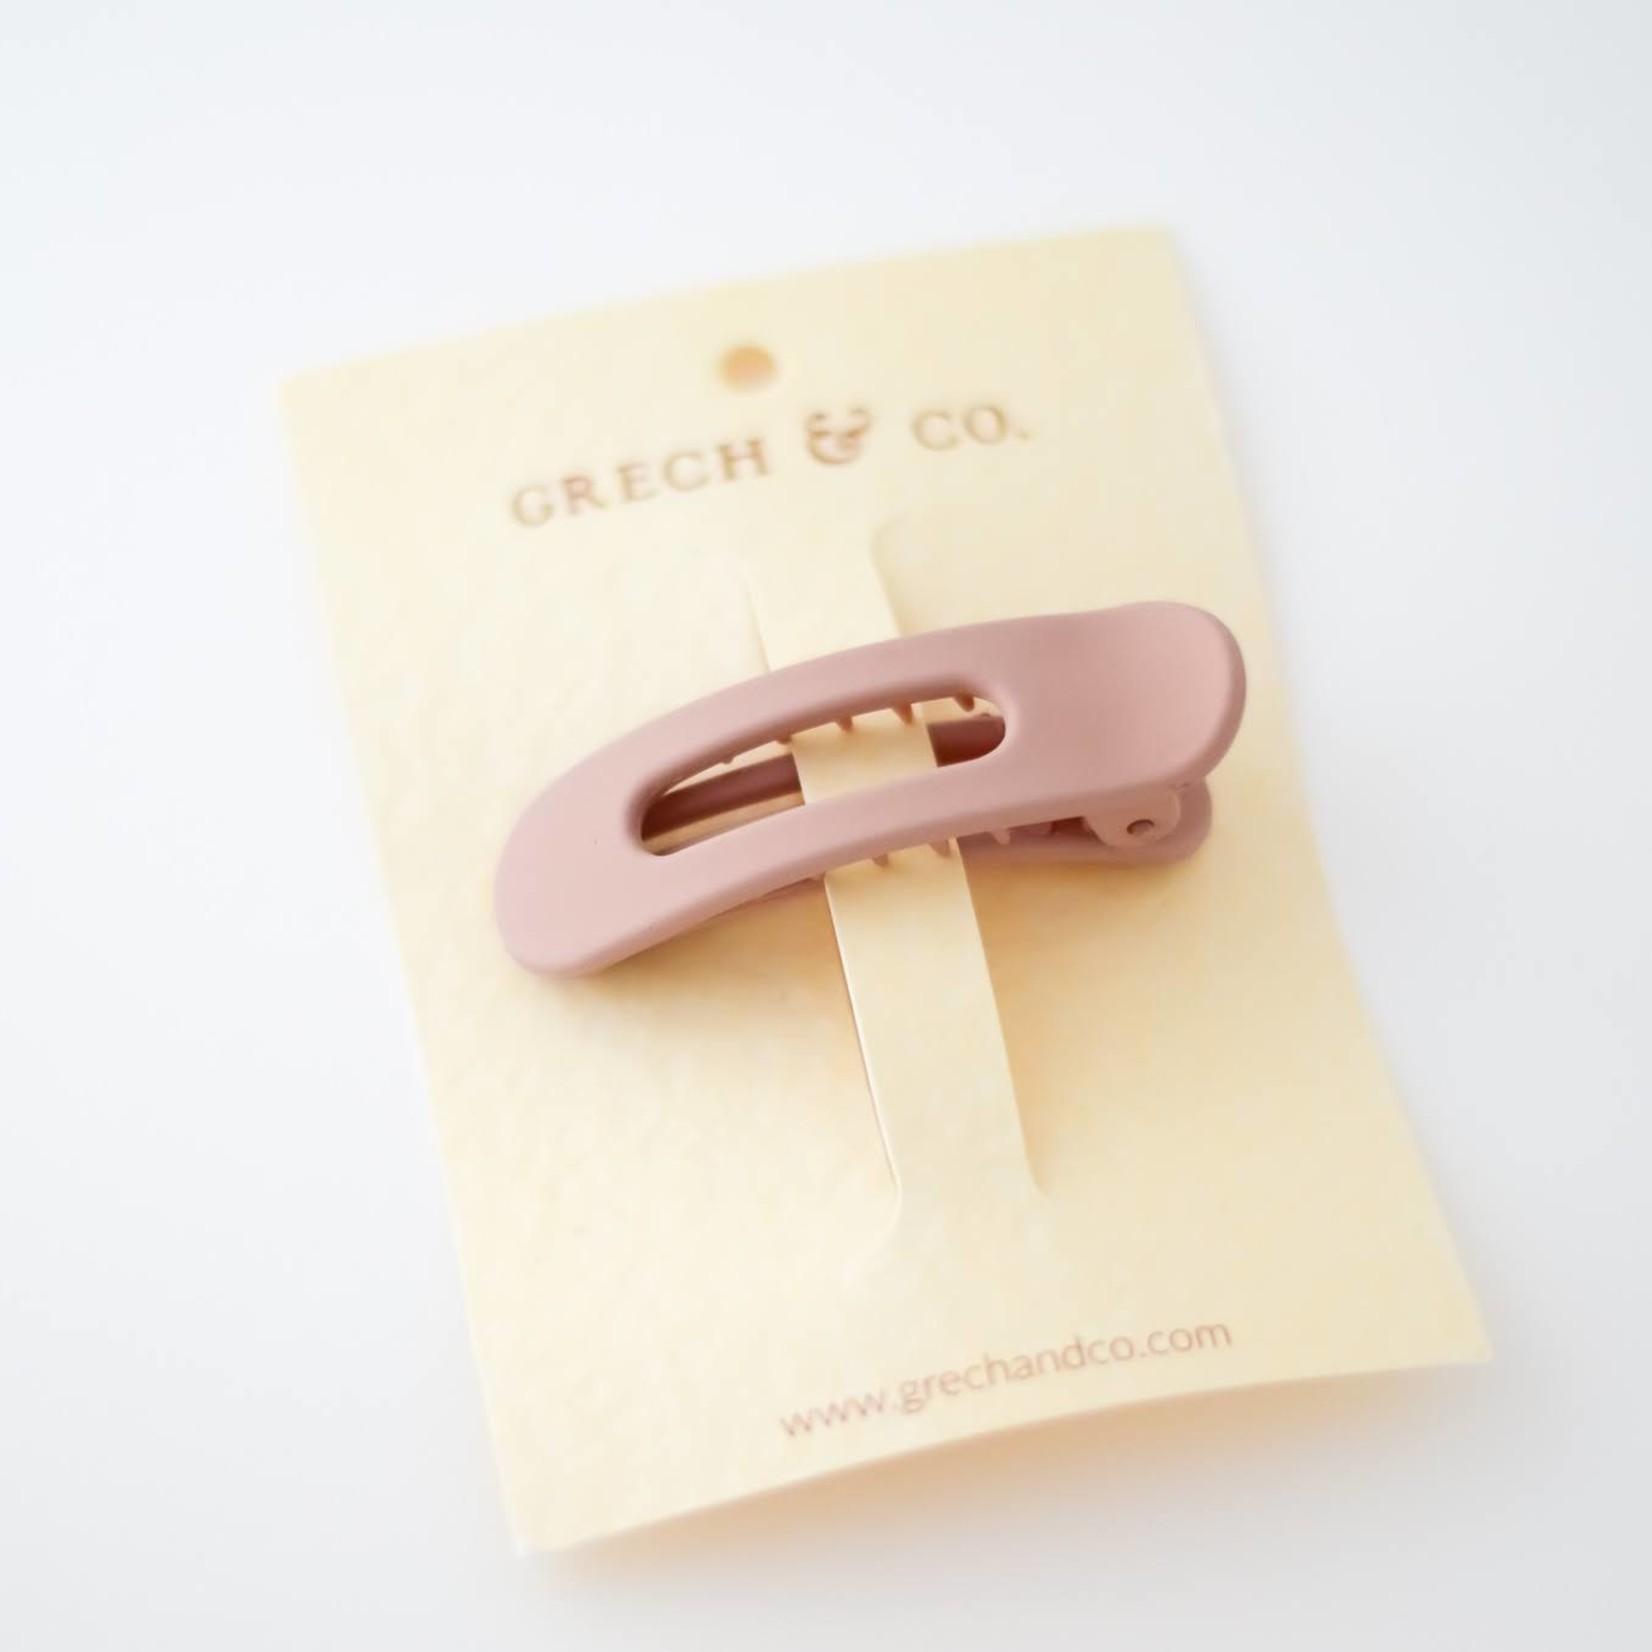 Grech & Co Grech & Co | Grip Clips - Shell